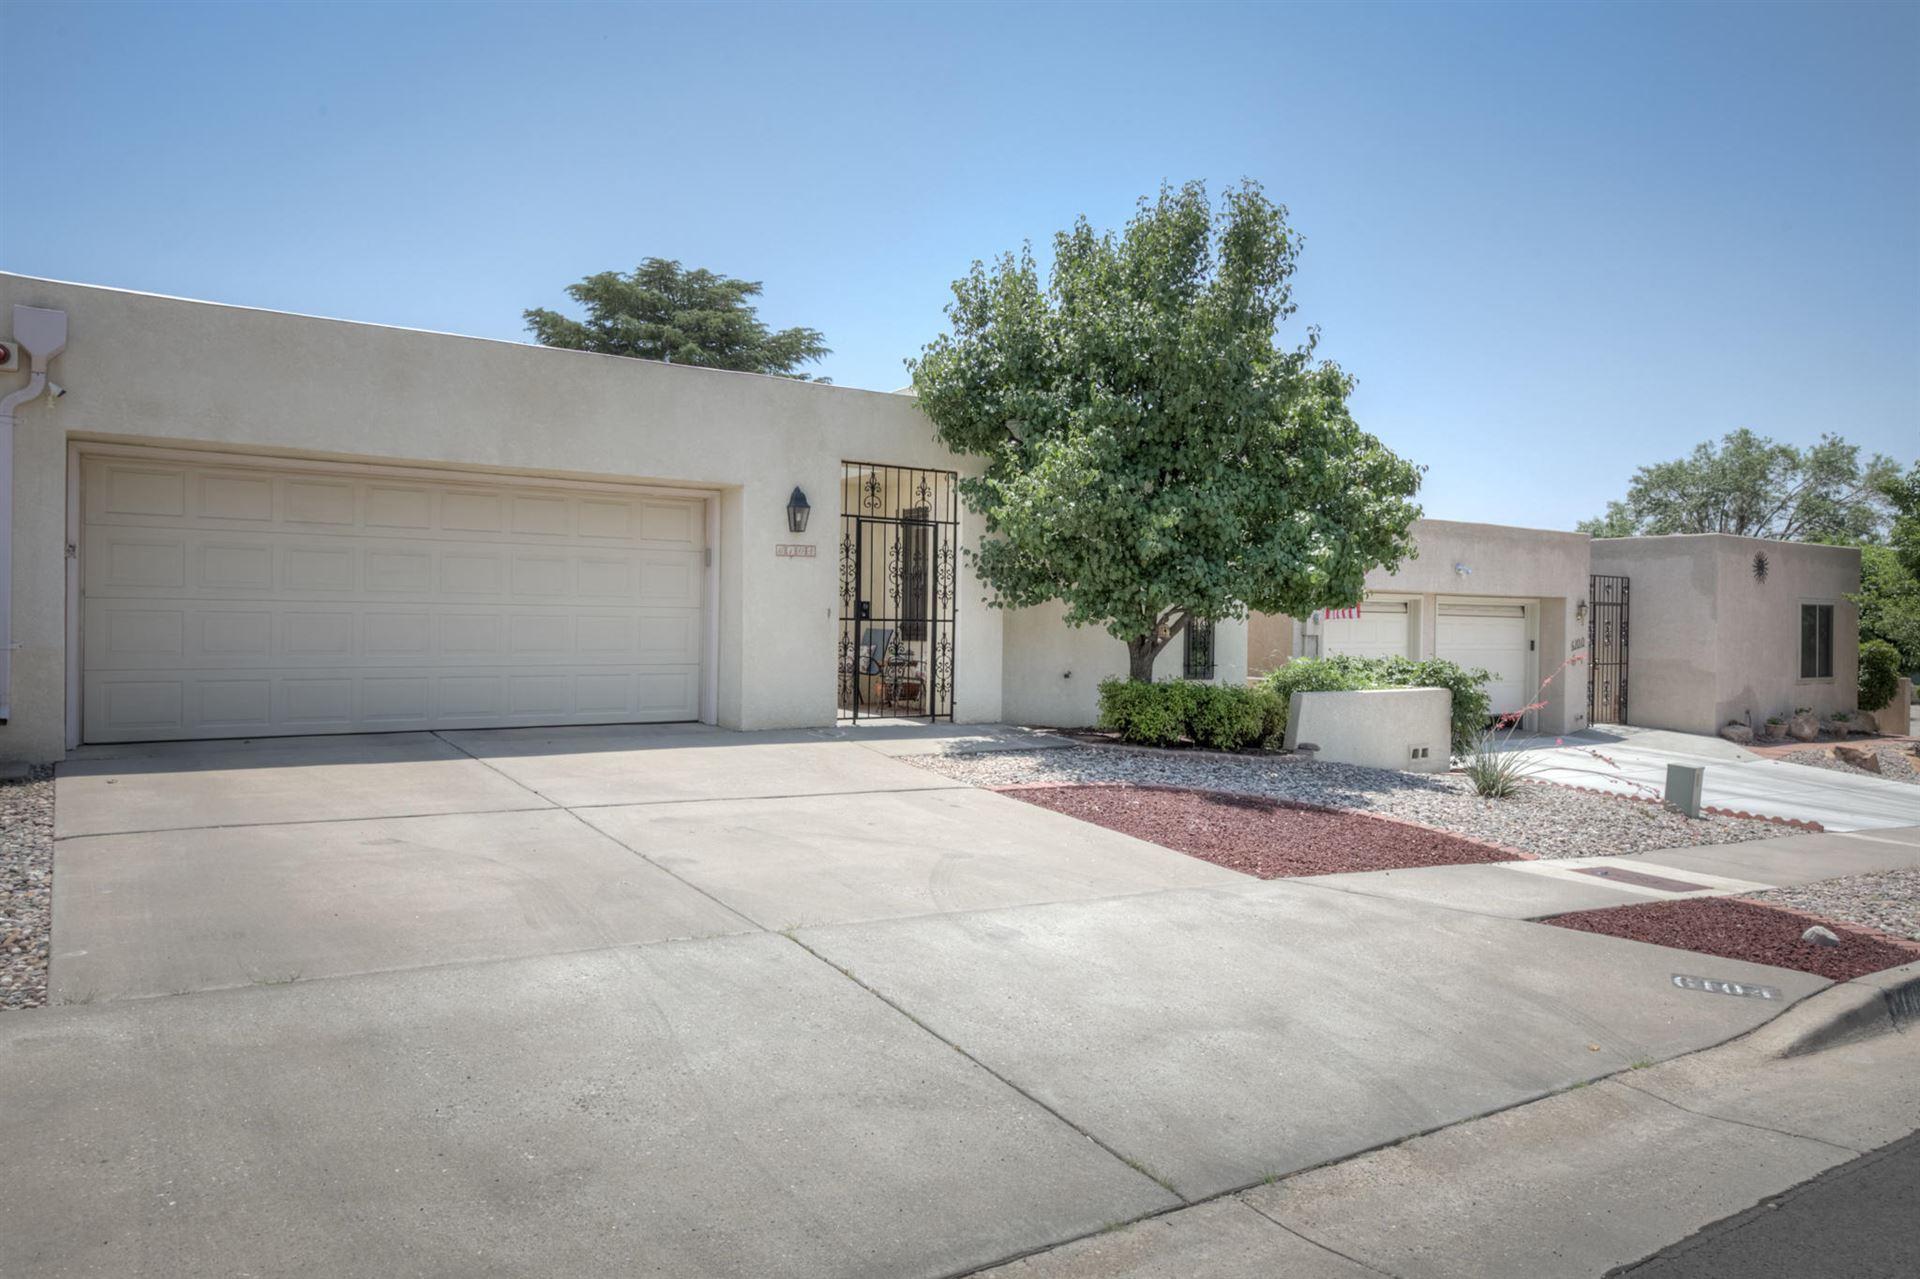 Photo of 6104 RIO HONDO Drive NE, Albuquerque, NM 87109 (MLS # 994526)